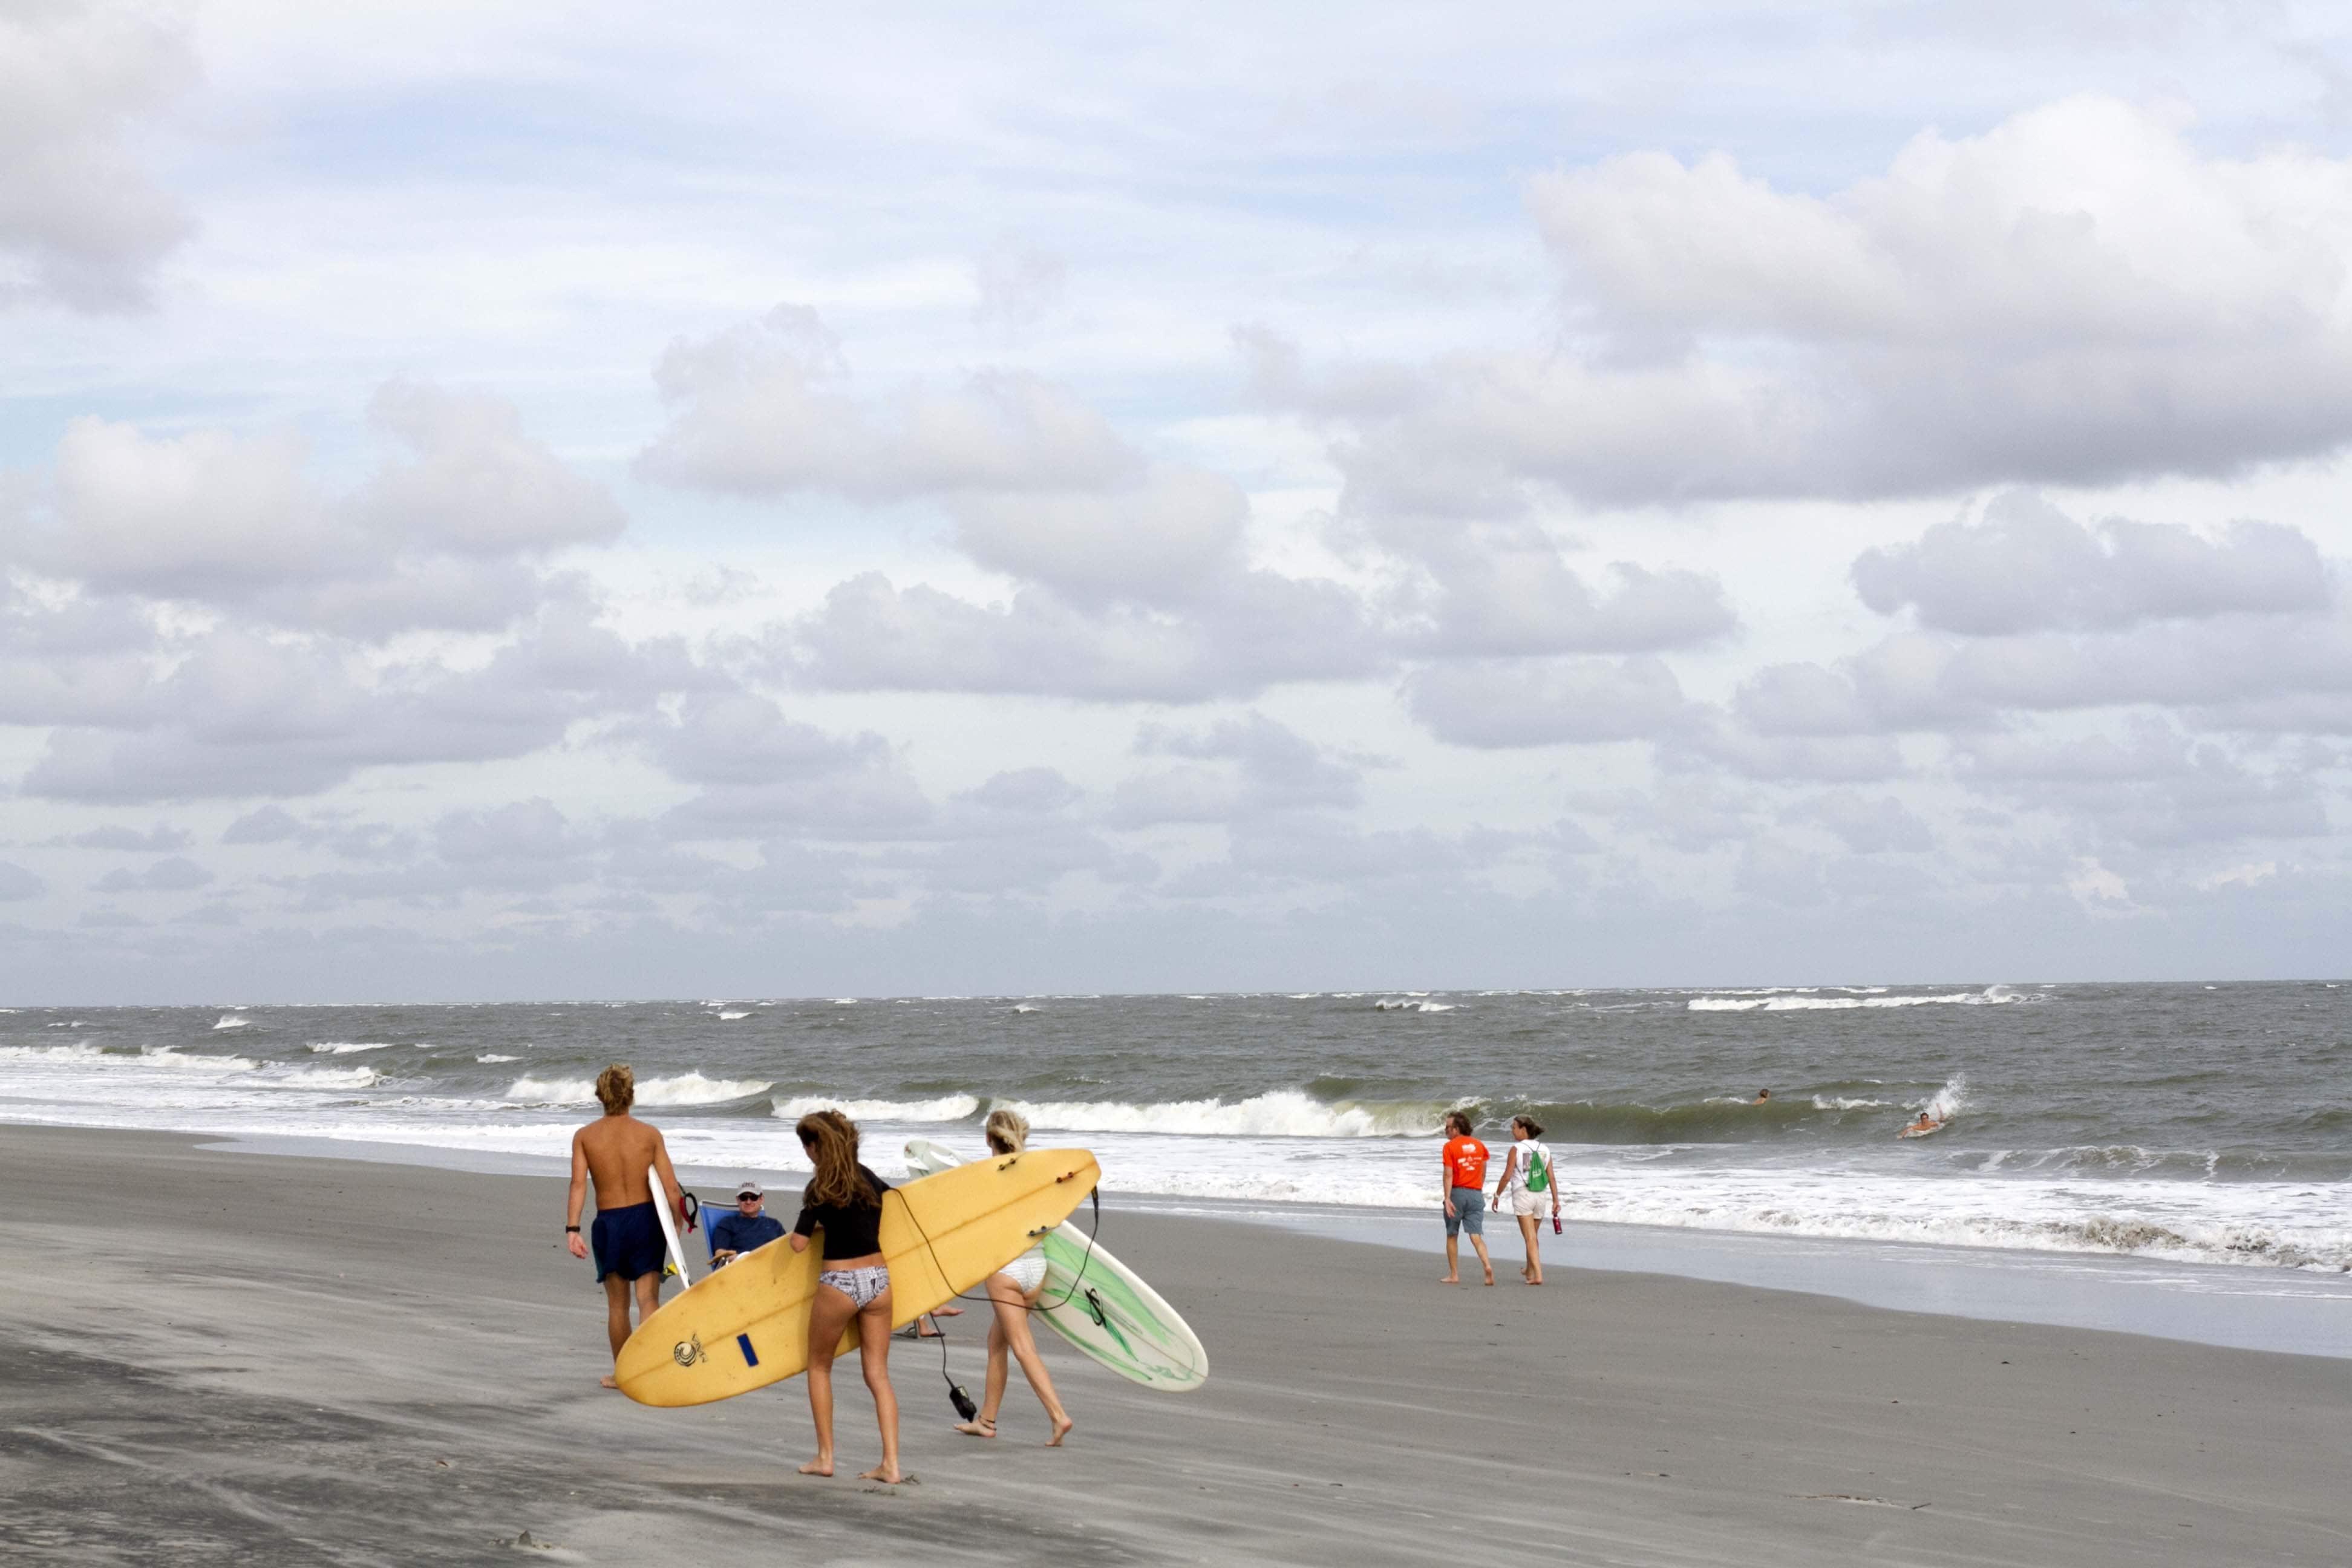 Surfers at Wild Dunes Resort